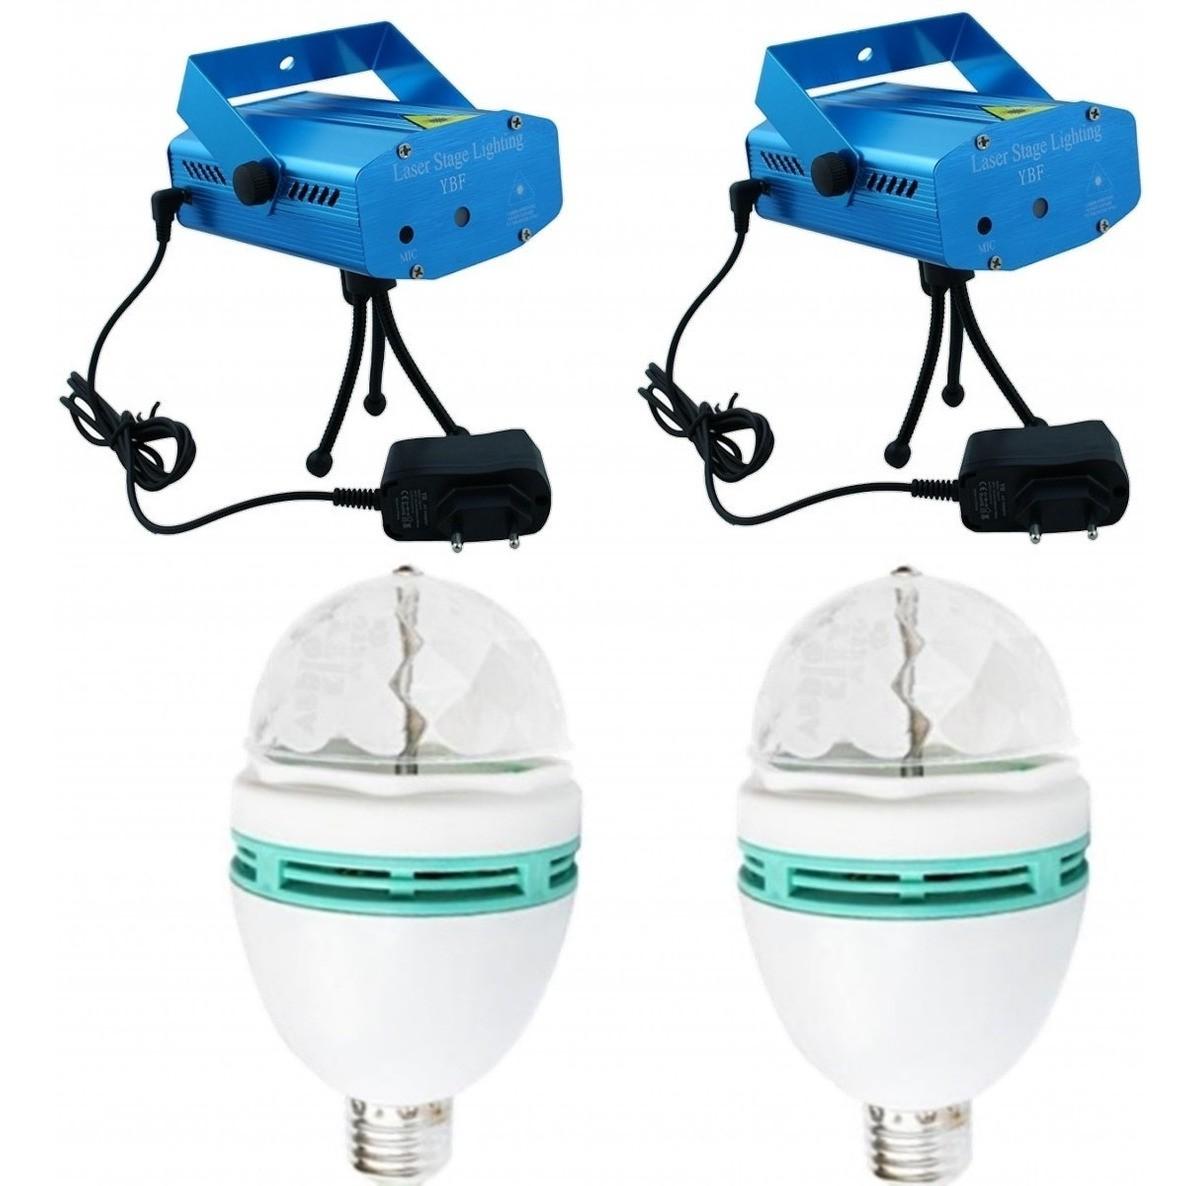 Kit 2 Projetor Holográfico Laser Efeitos Especiais 2 Lampada